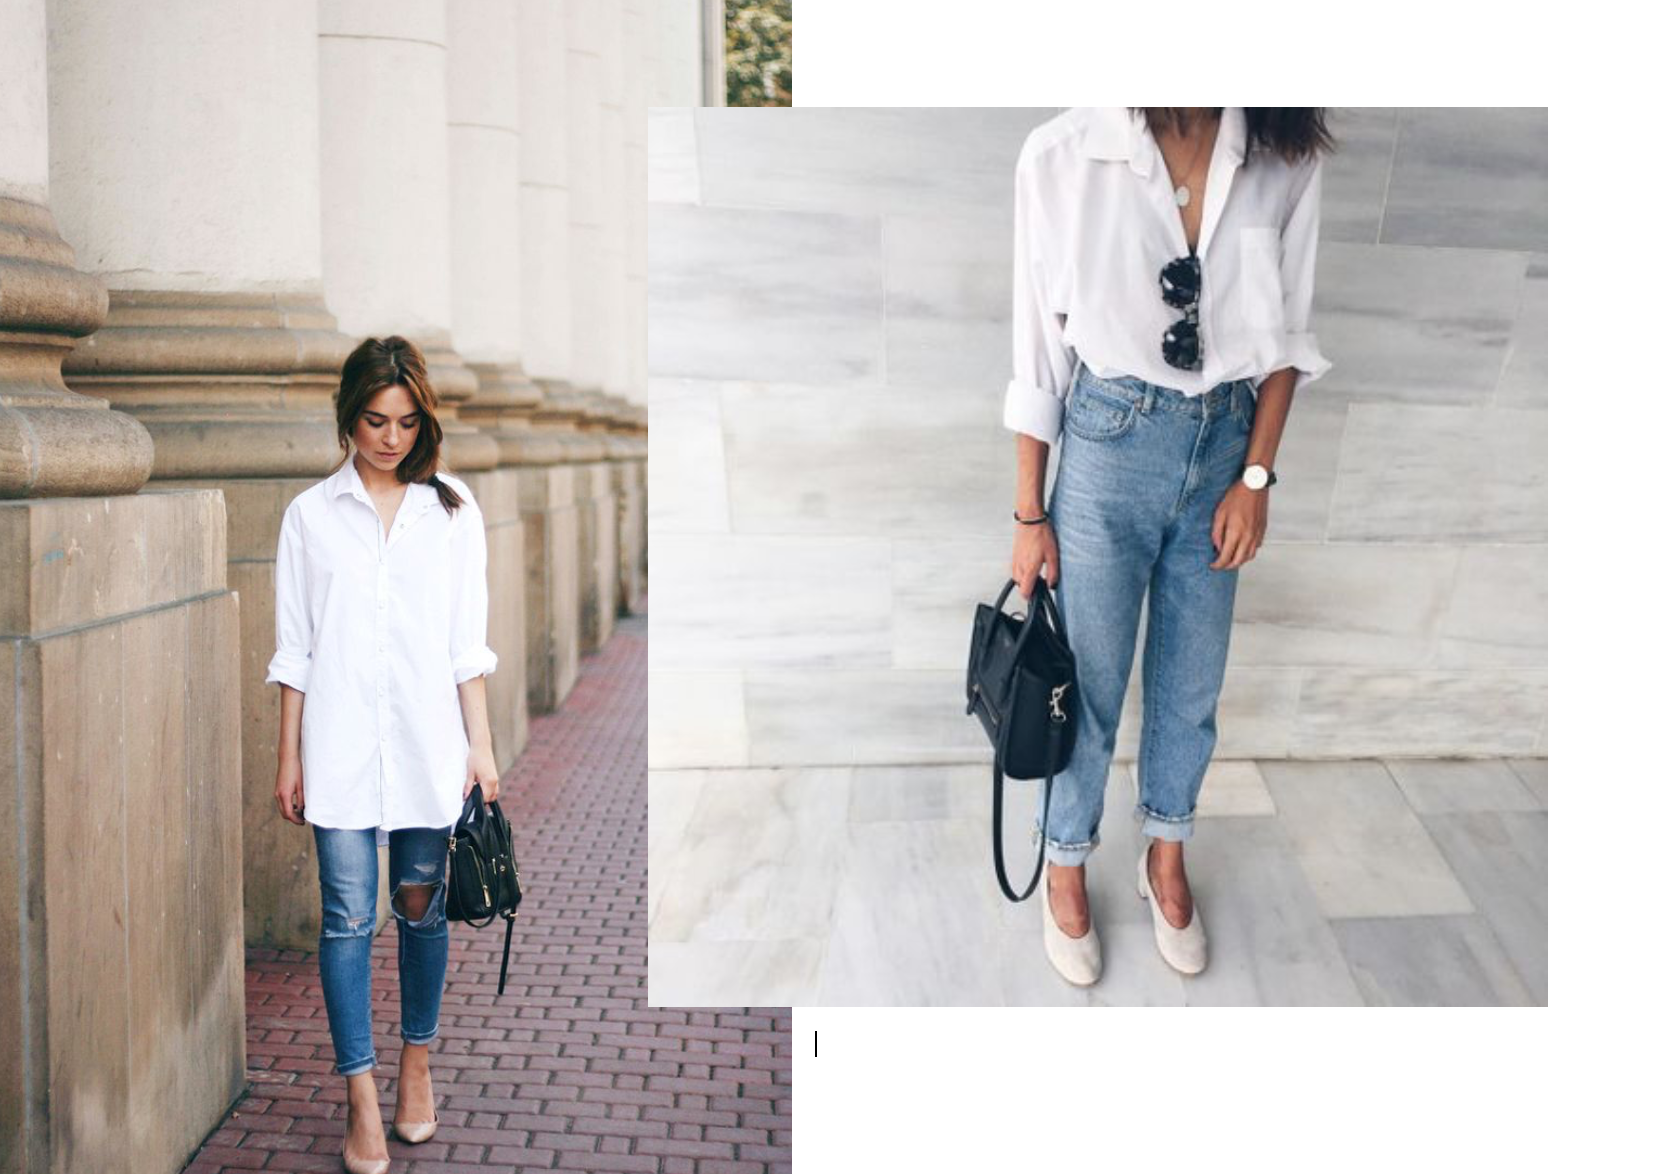 Inspo Blue Jeans White Shirt 007 | Love Style Mindfulness